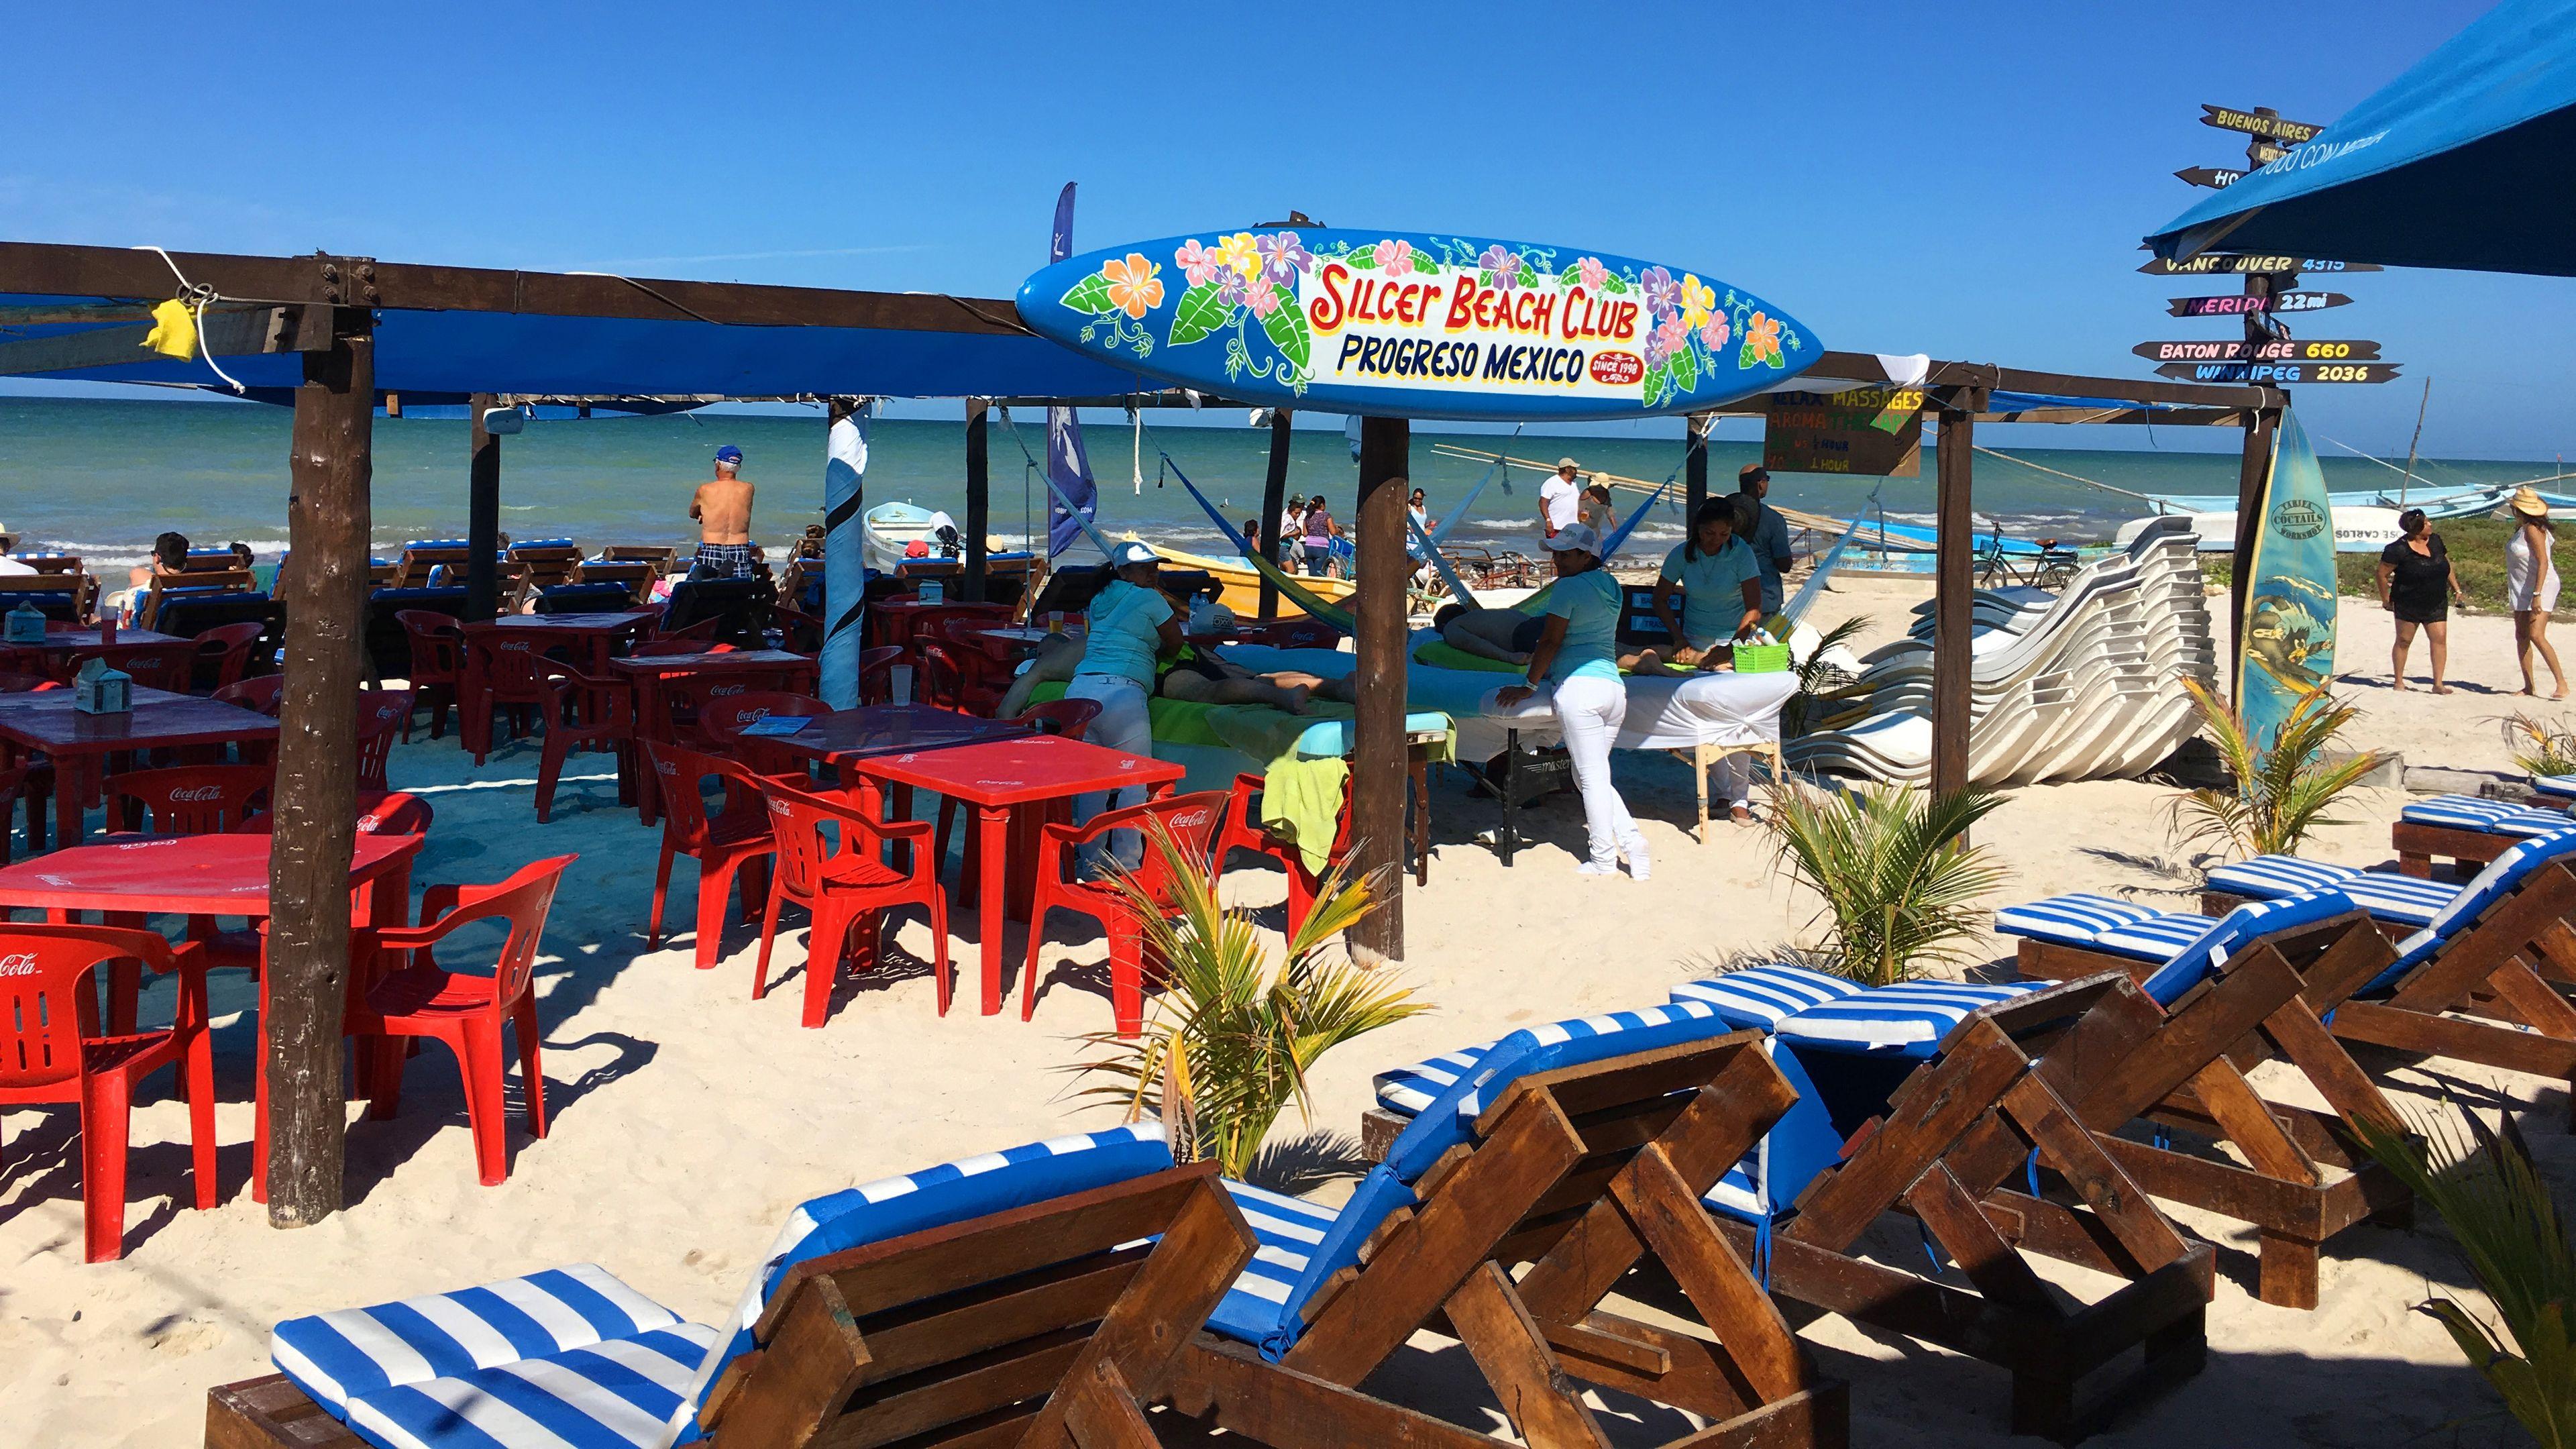 Silcer Beach Club Day Pass